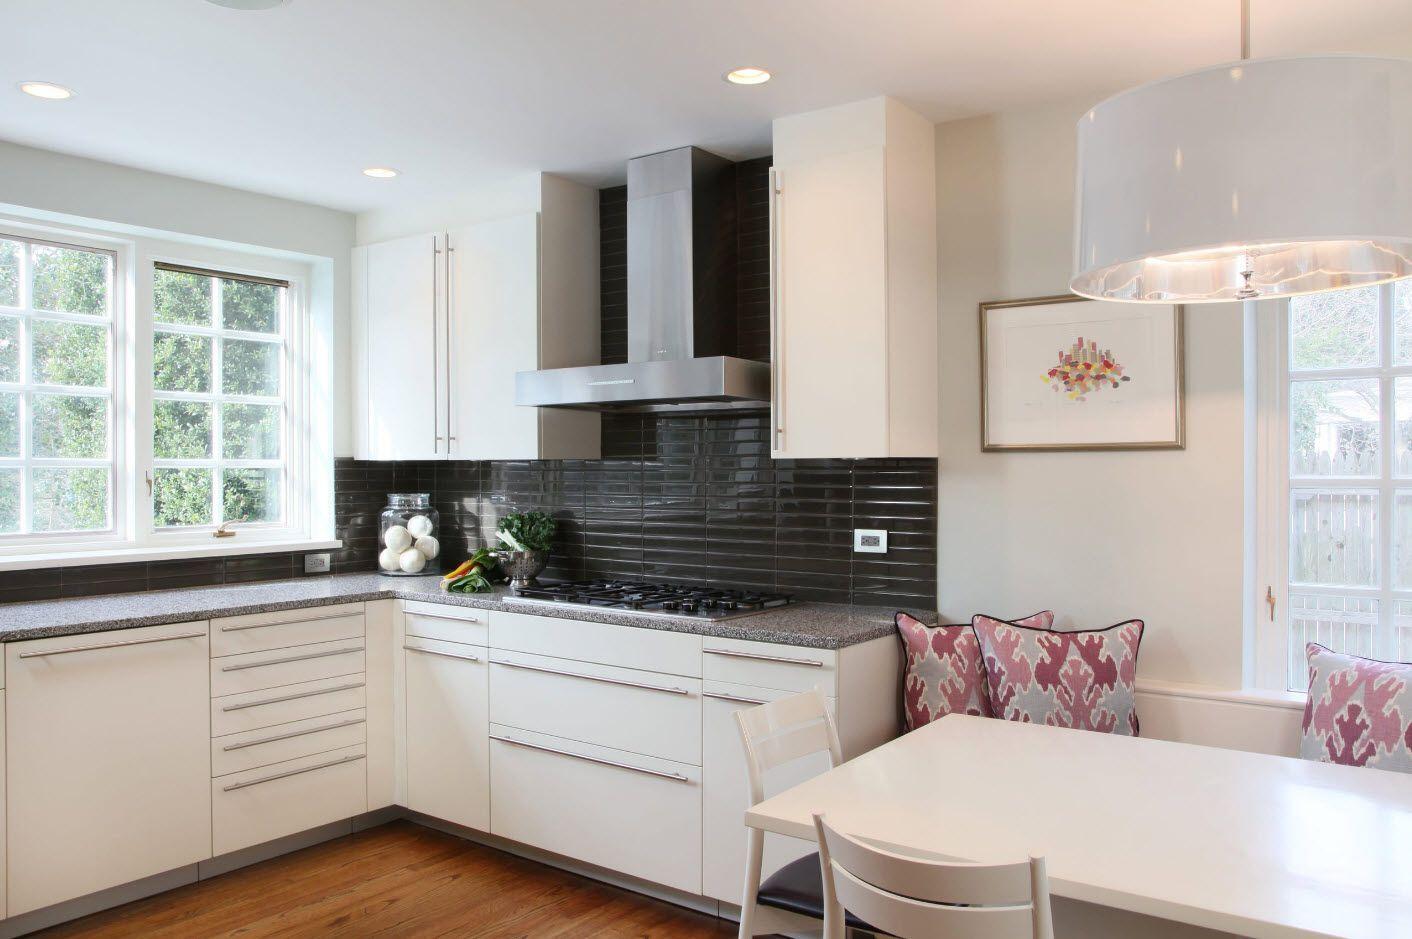 White interior of the kitchen with black tiled backsplash